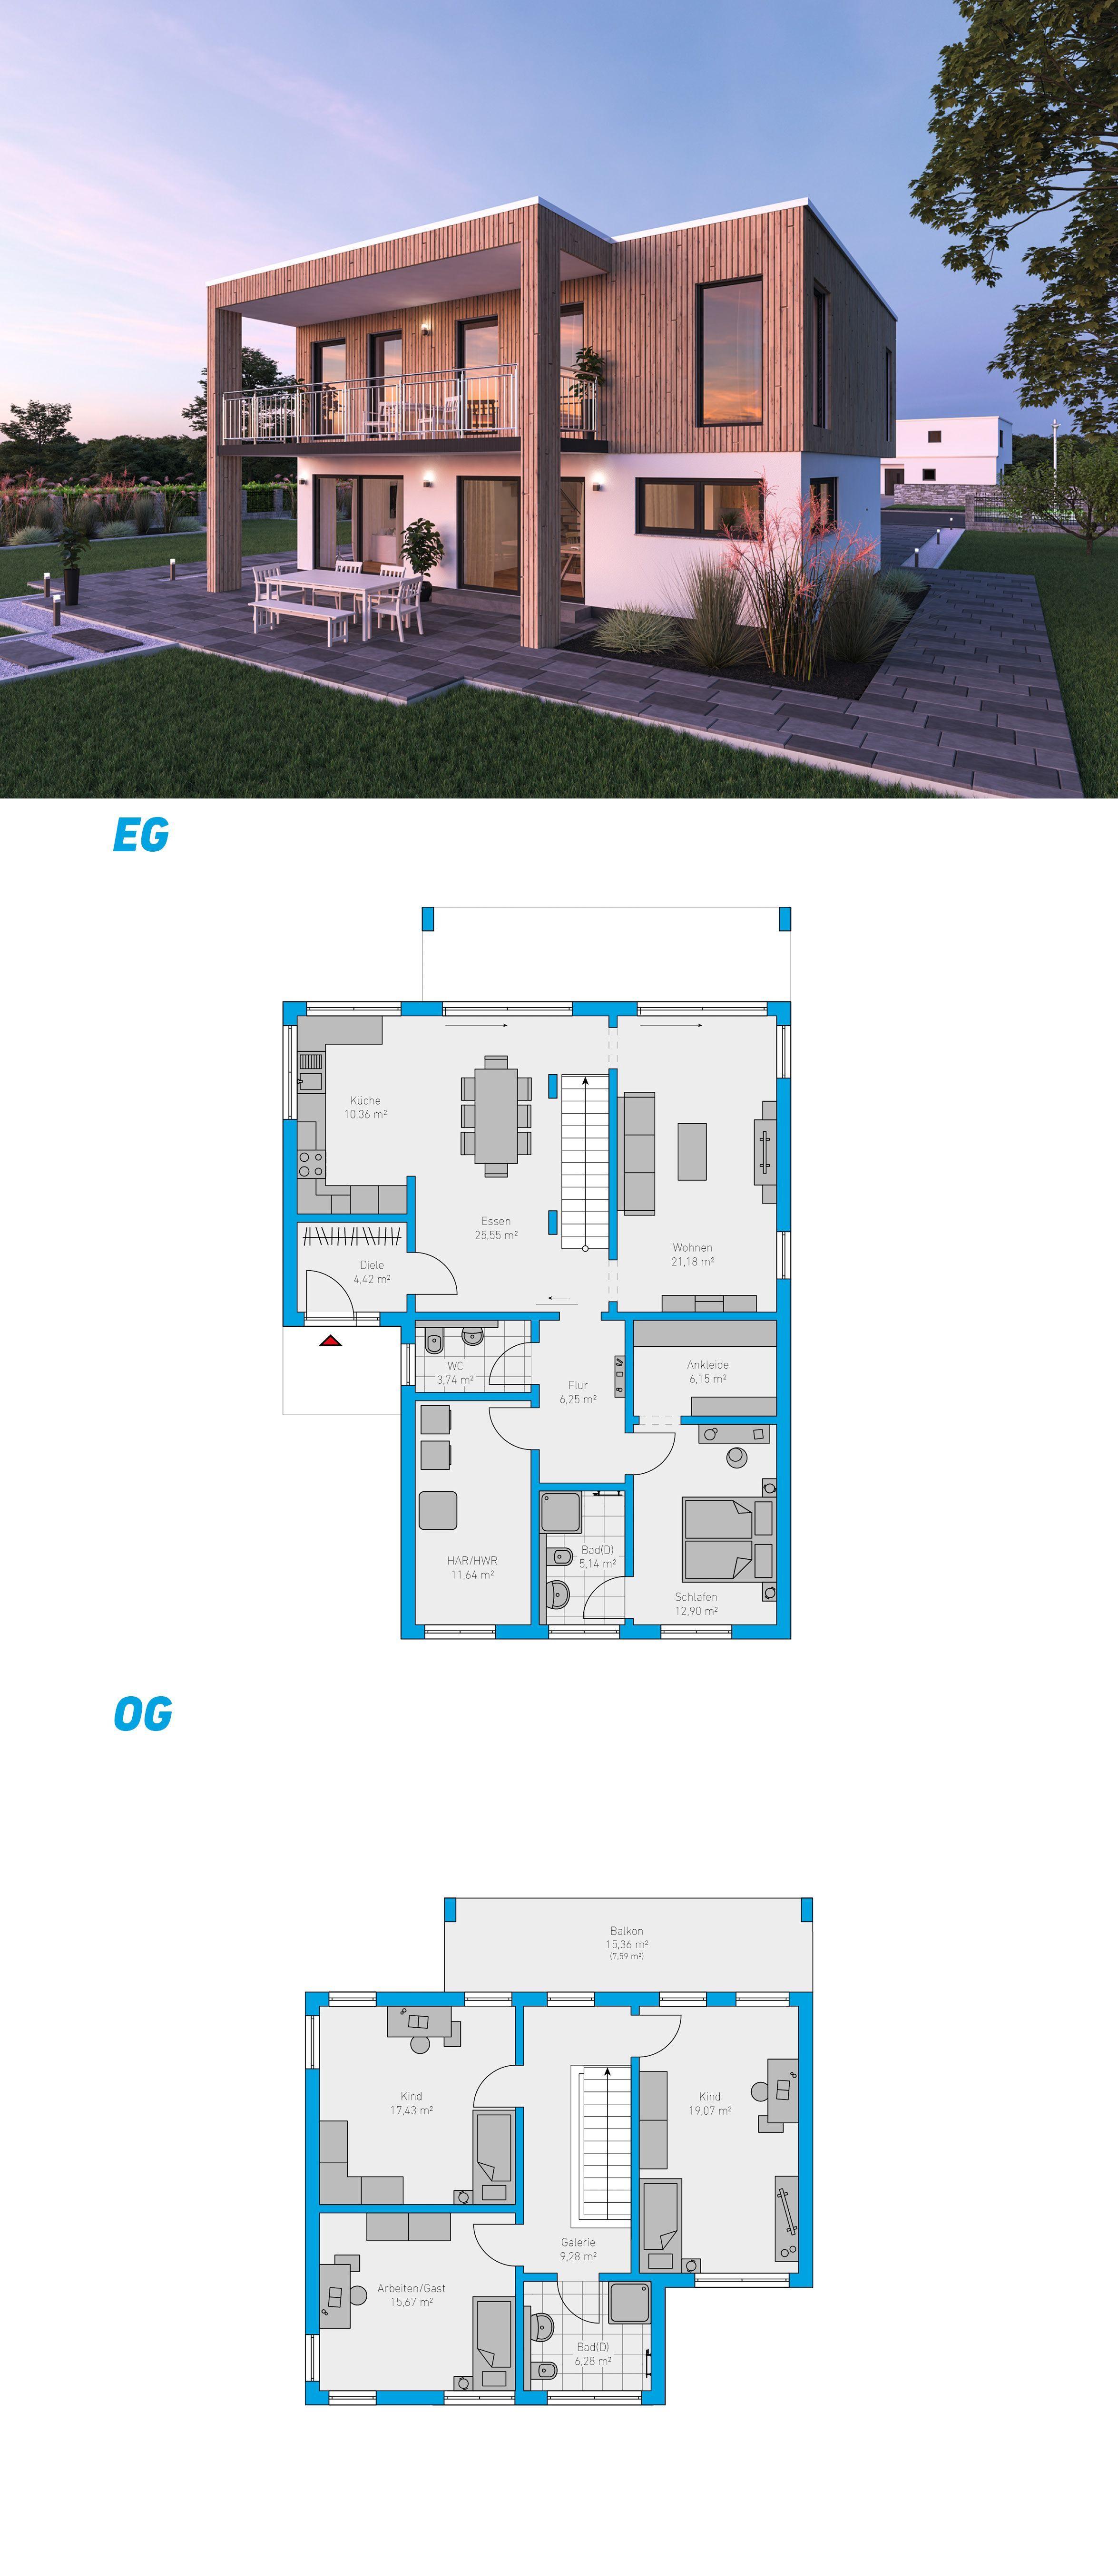 Alea 190 schlüsselfertiges Massivhaus 2geschossig